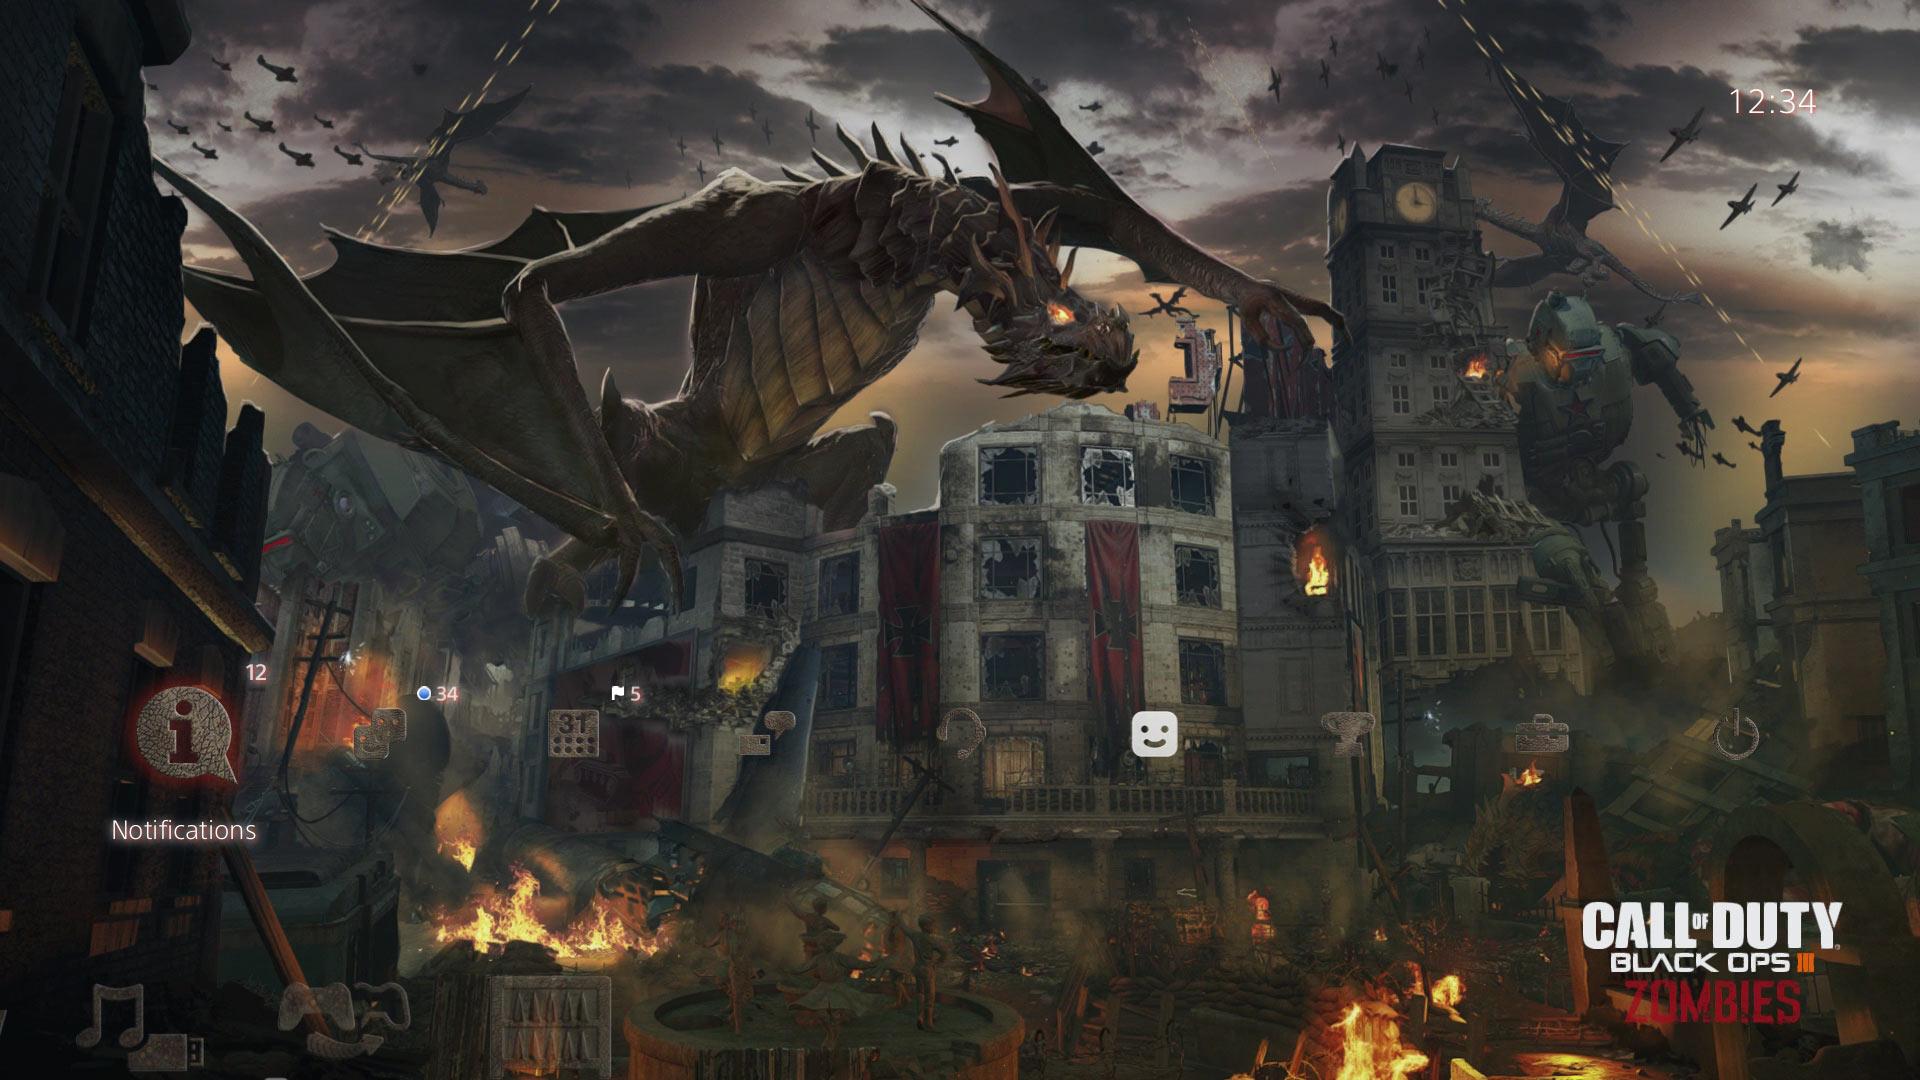 Black Ops 3 DLC 3 Zombie Map: Gorod Krovi in Stalingard | NeoGAF